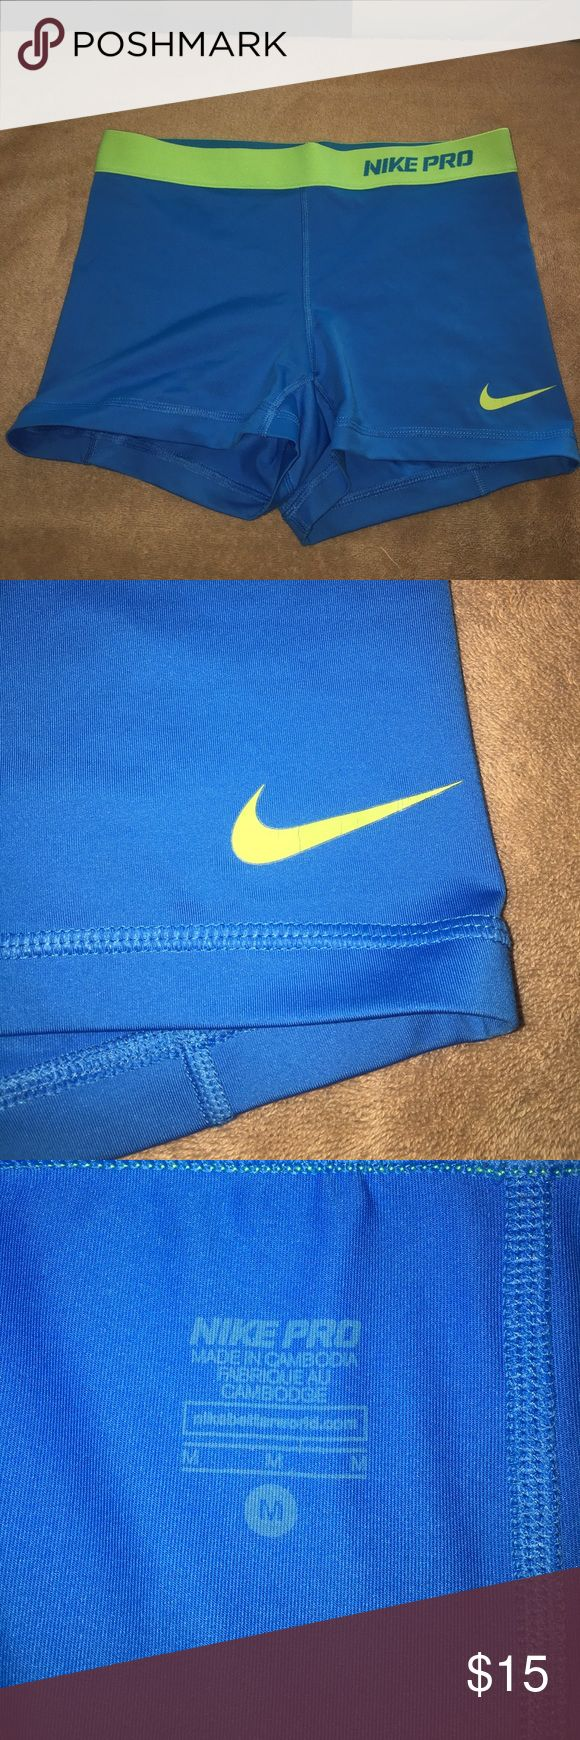 Light blue Nike pro dri-fit spandex sport shorts Great condition. Light blue shorts with neon yellow waist band. Size medium Nike Shorts